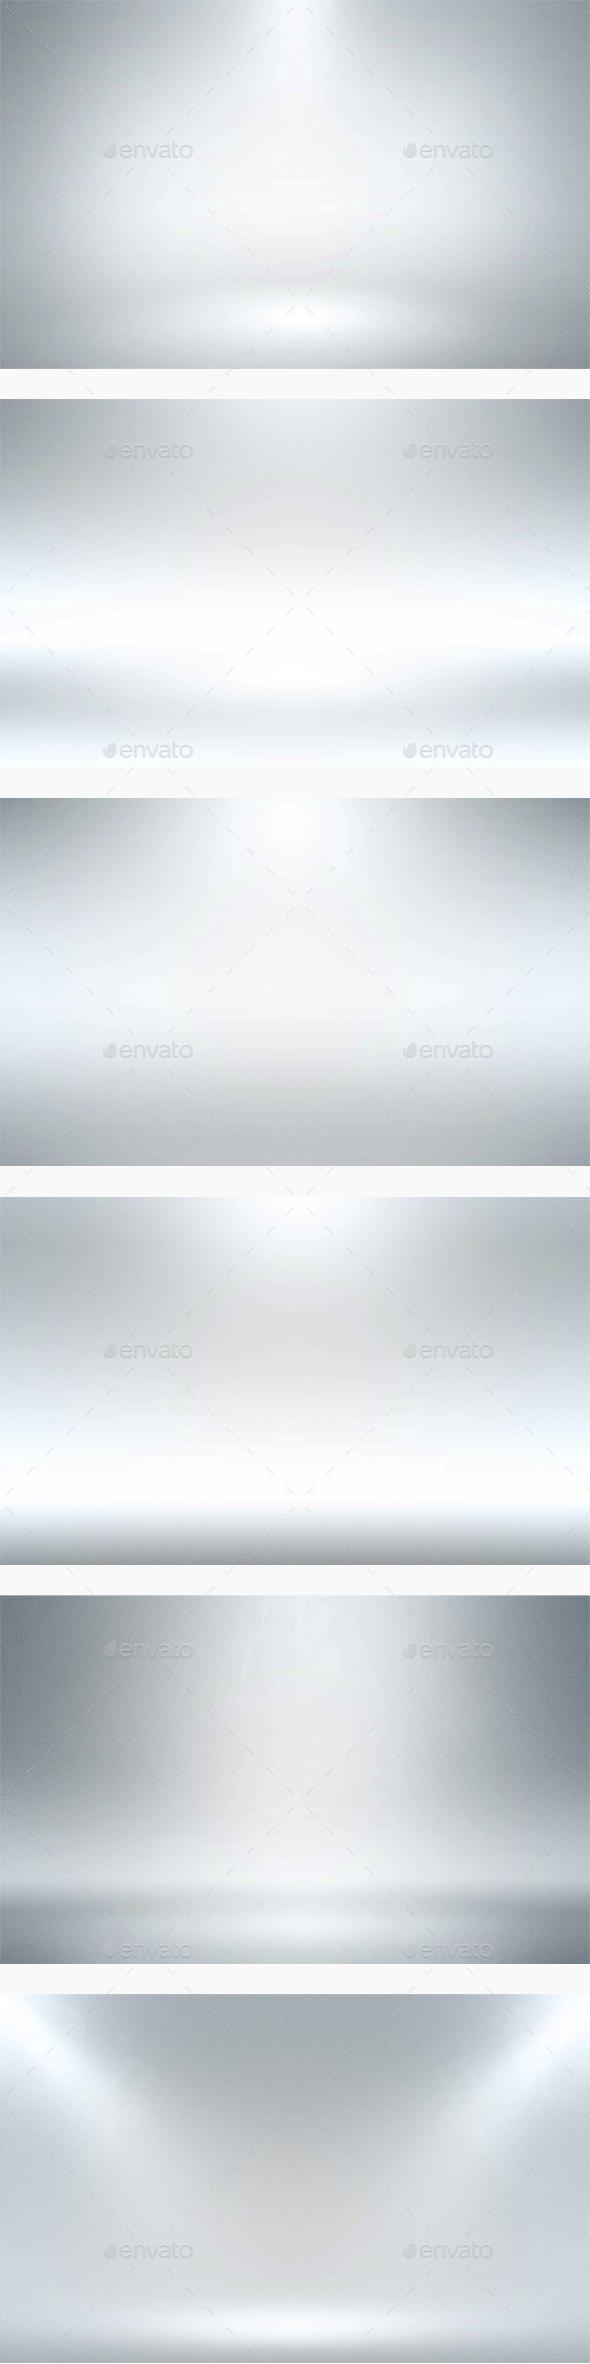 Infinite White Floor Spotlight Backgrounds - Backgrounds Graphics